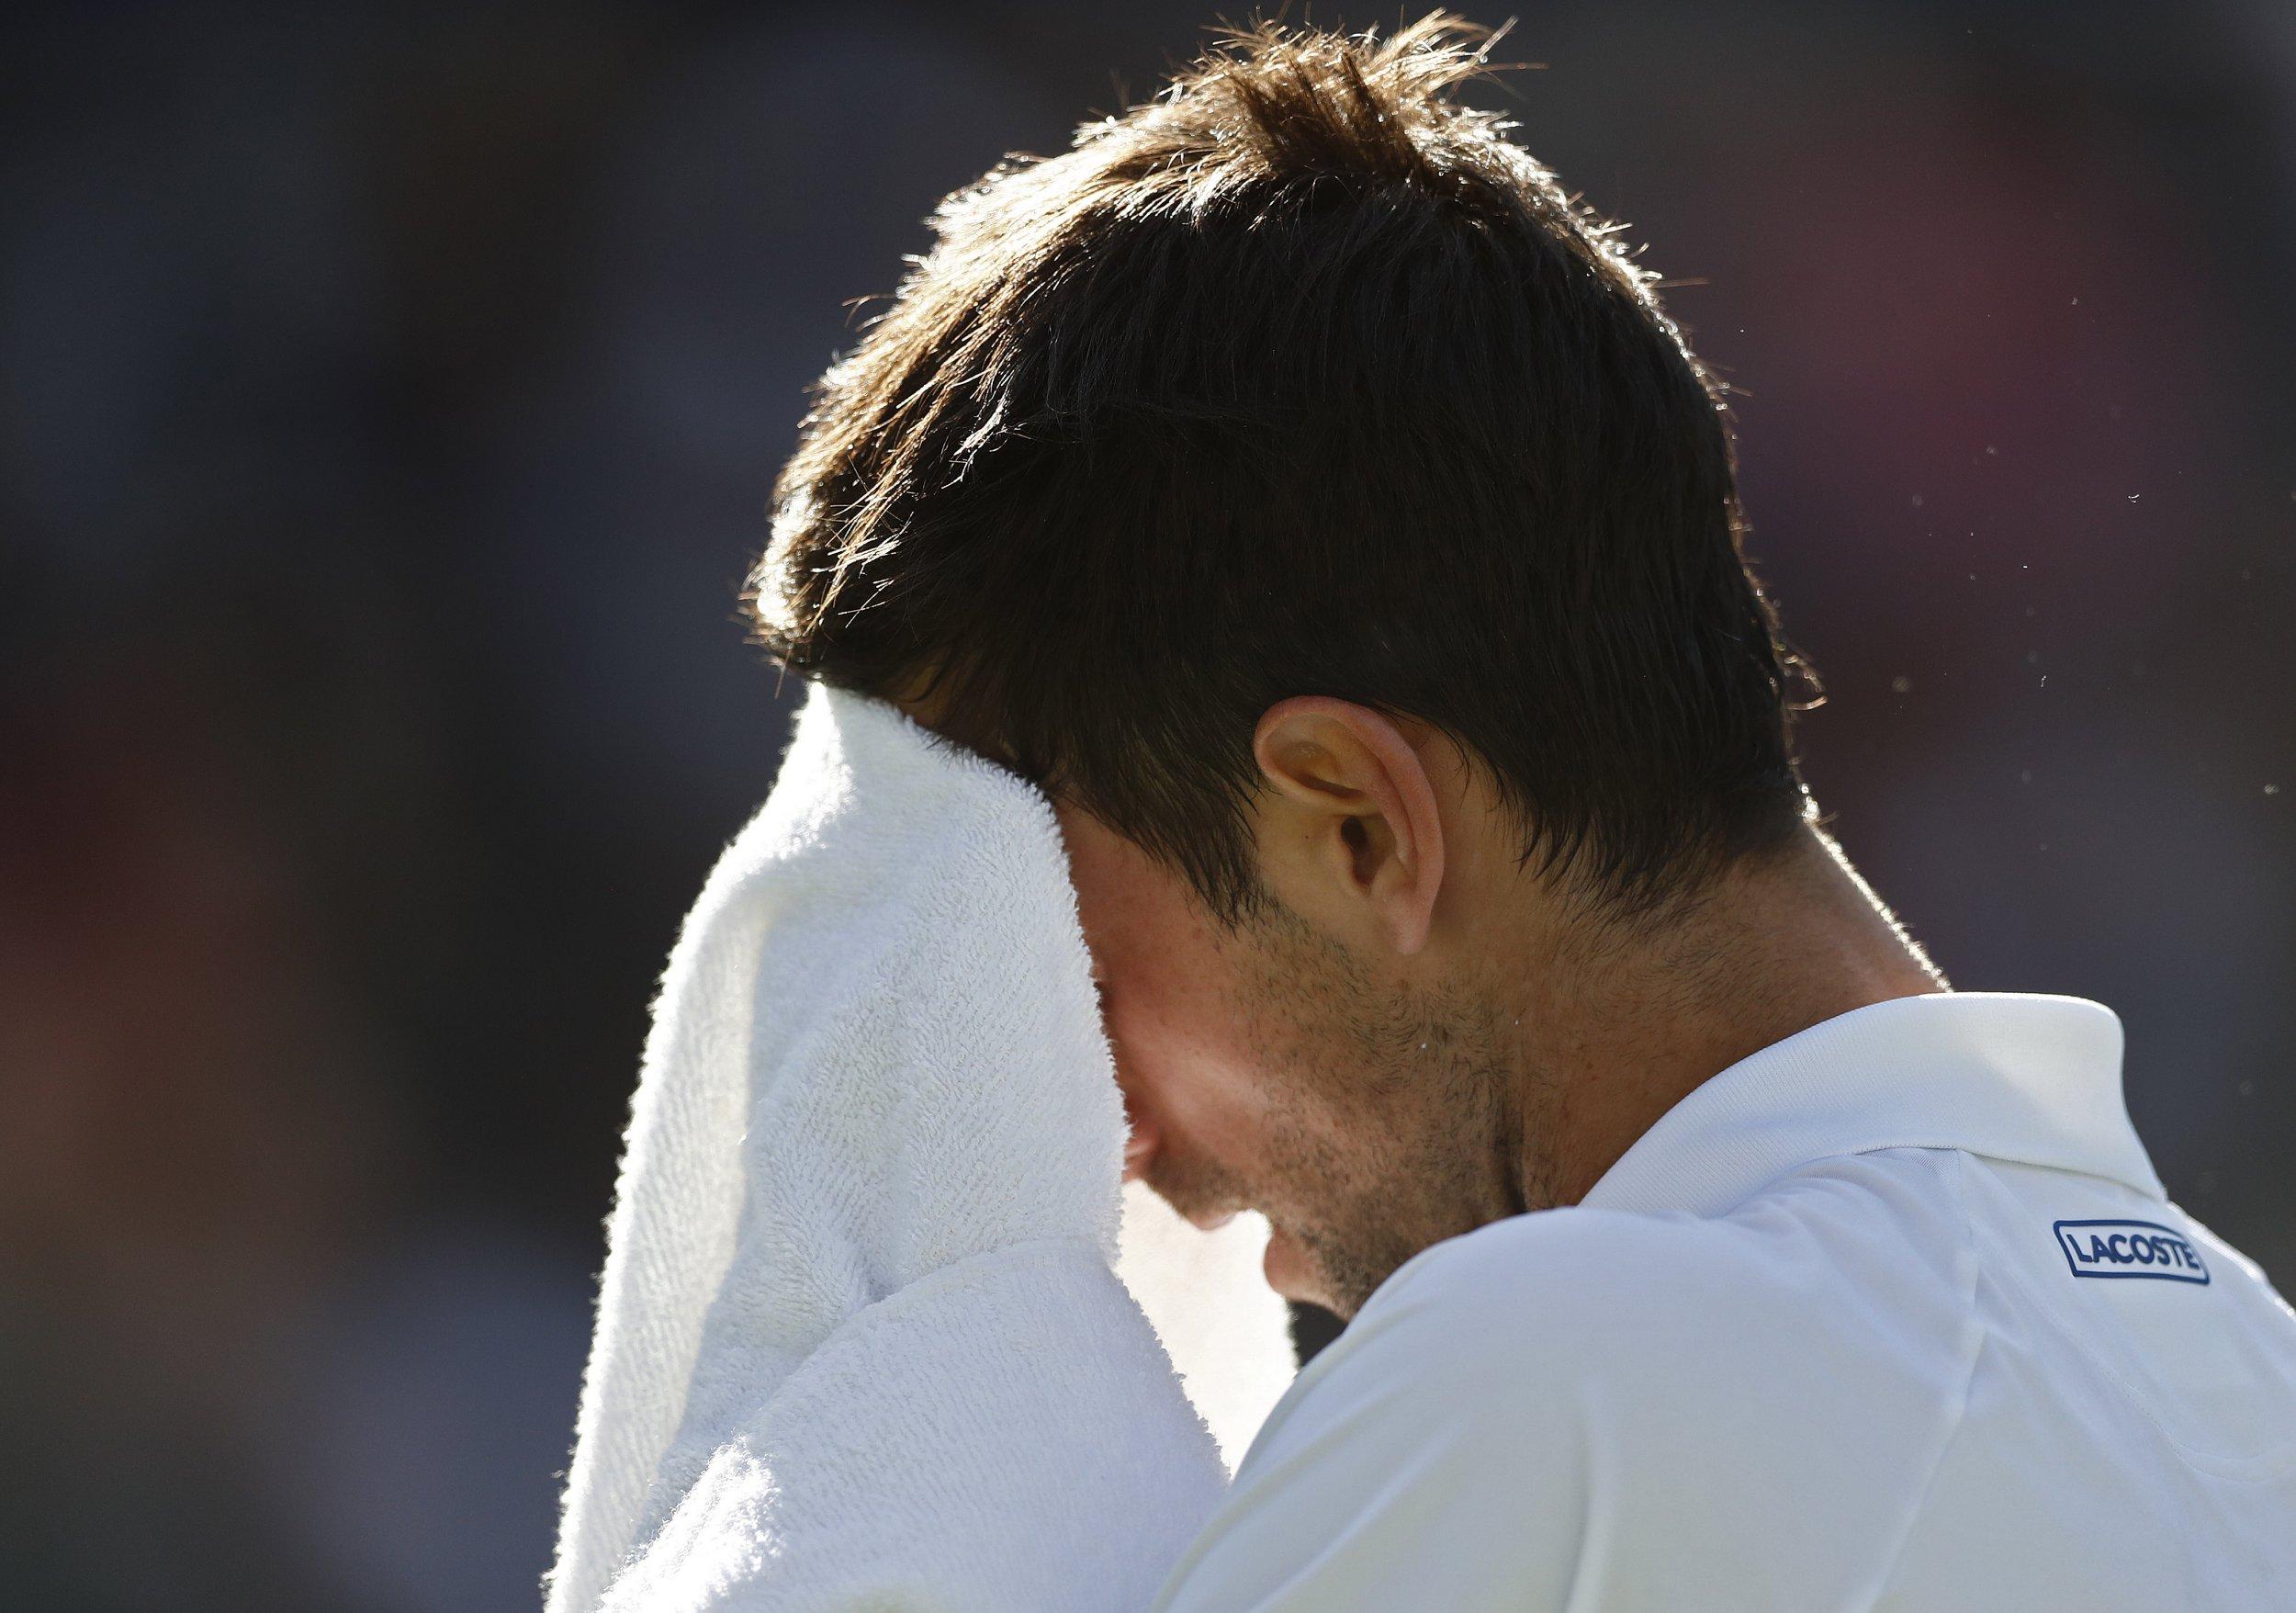 Indian Wells: Djokovic and Osaka out, Edmund sets up Federer tie, Nadal through